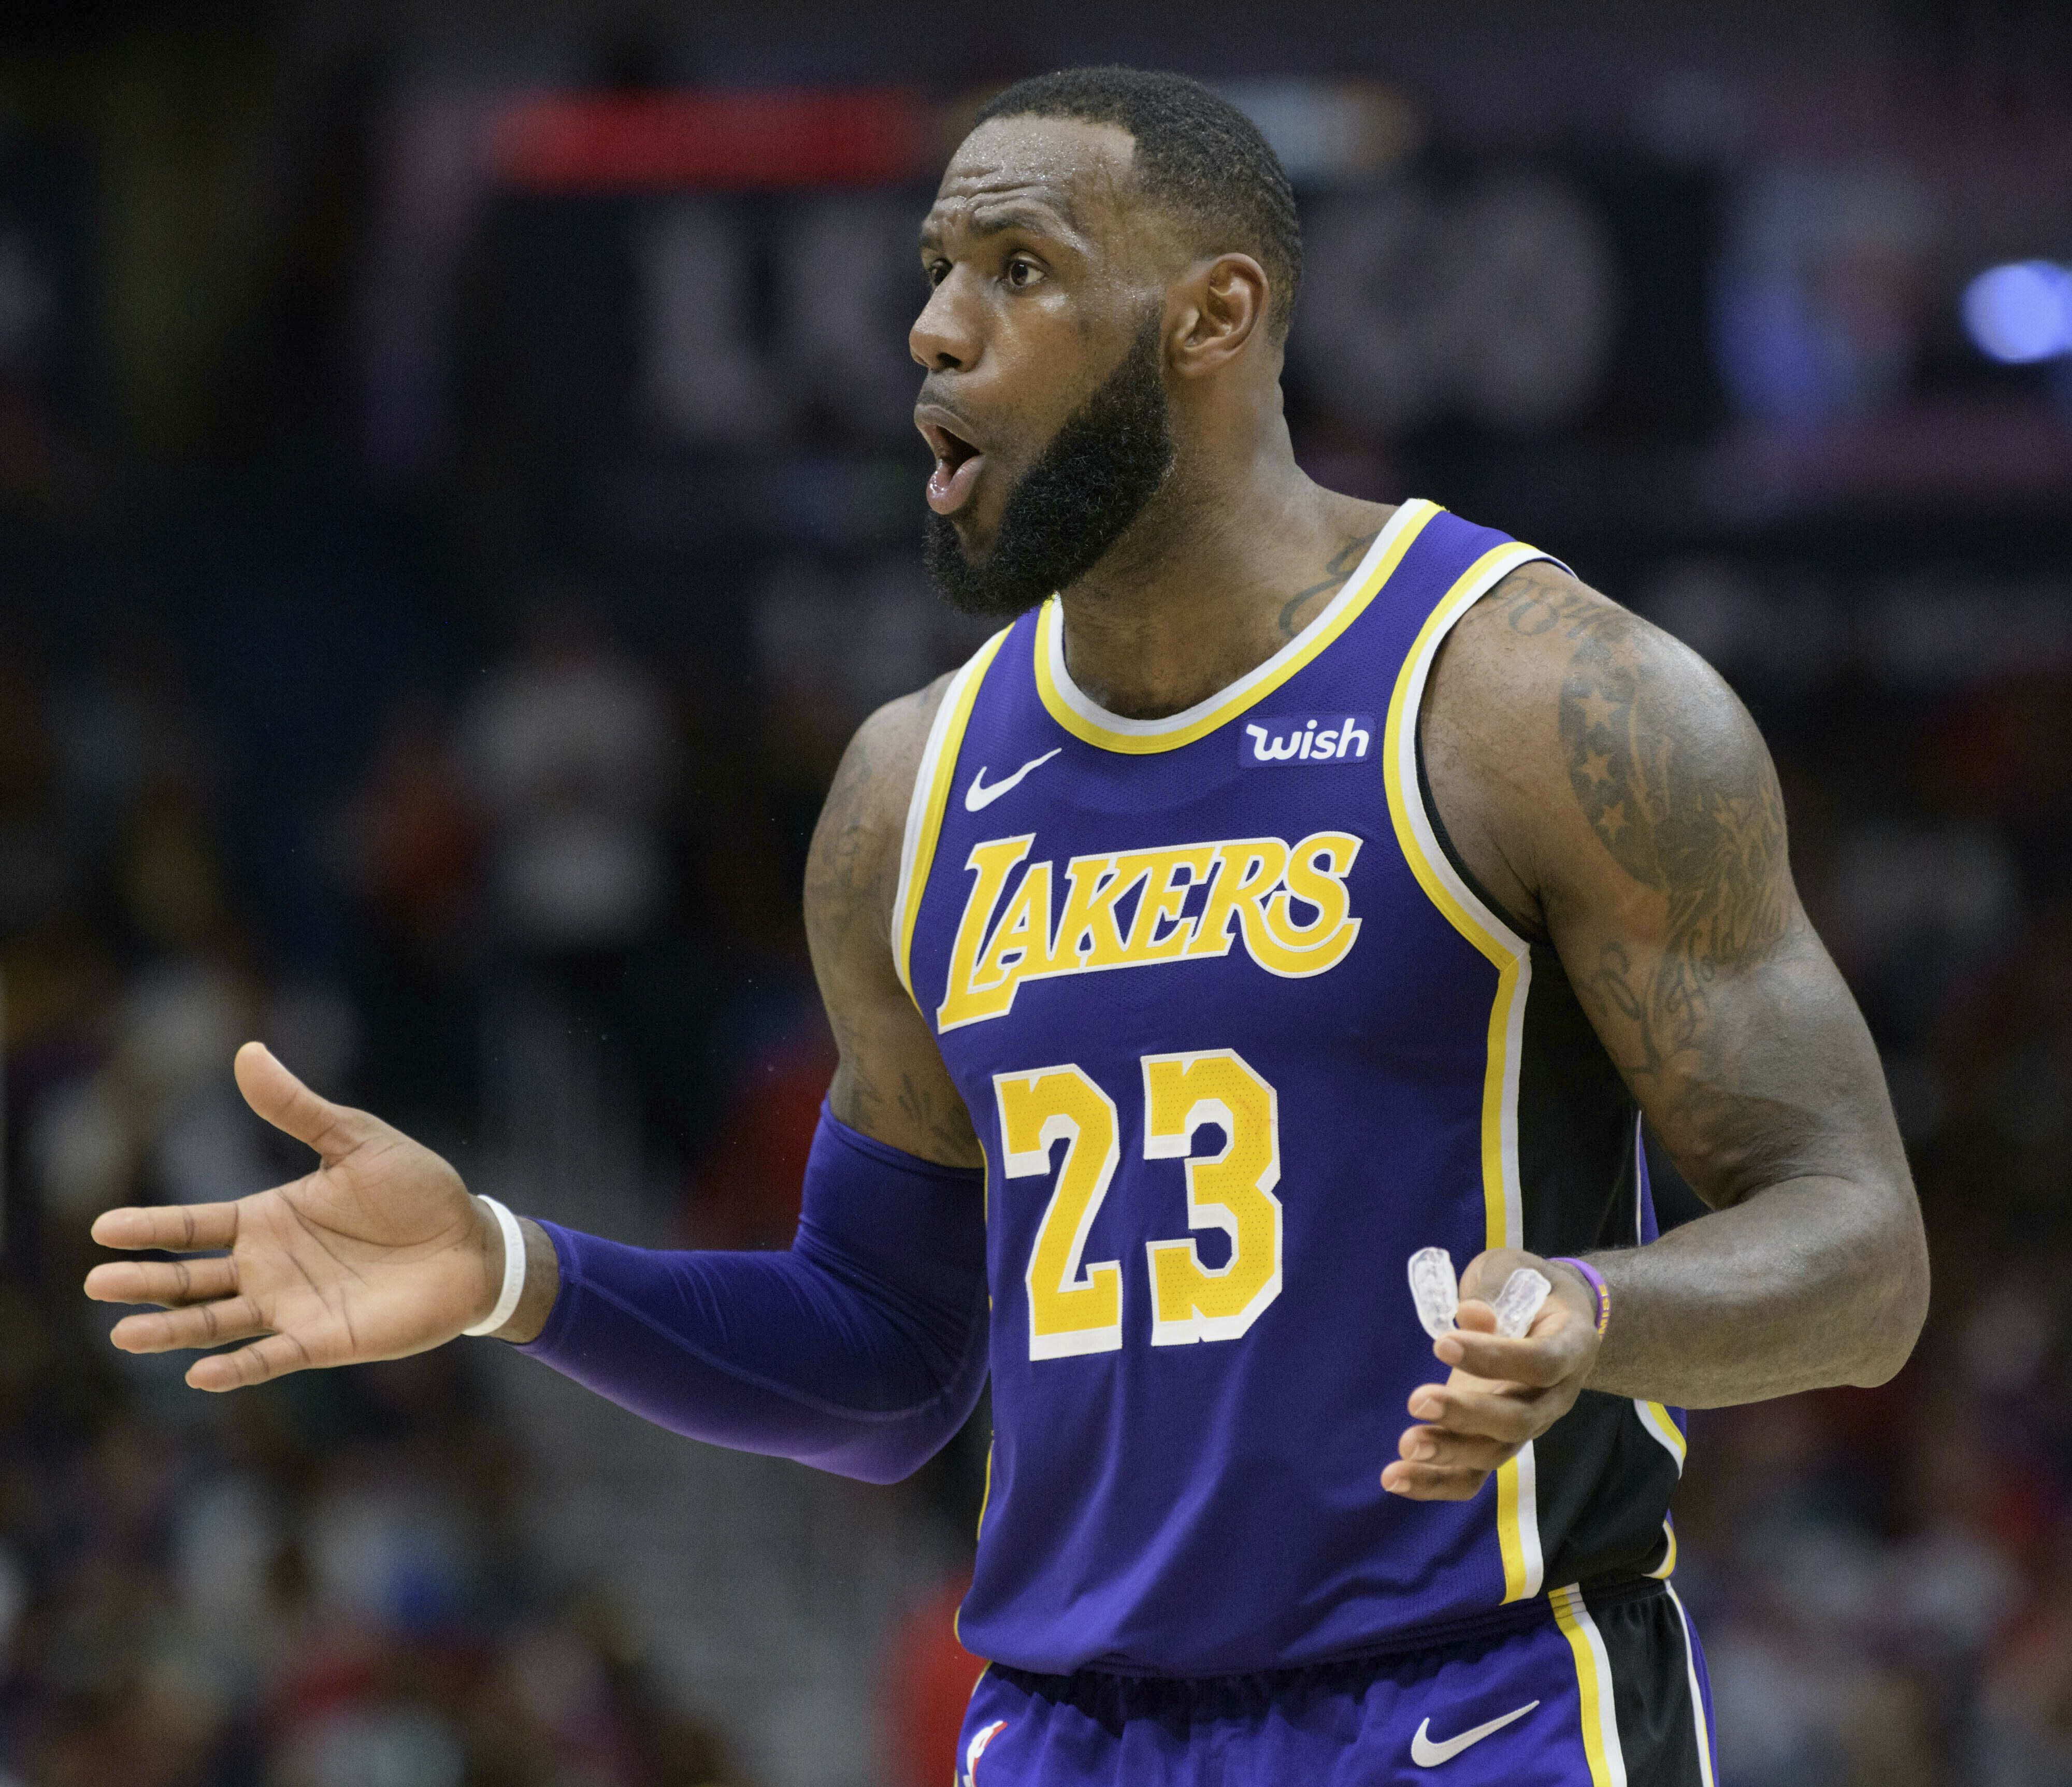 Nba Executive Lebron James Killed The Lakers Chemistry During Anthony Davis Trade Talks Yahoo Sports Nba E Detroit Sports Los Angeles Lakers Lebron James